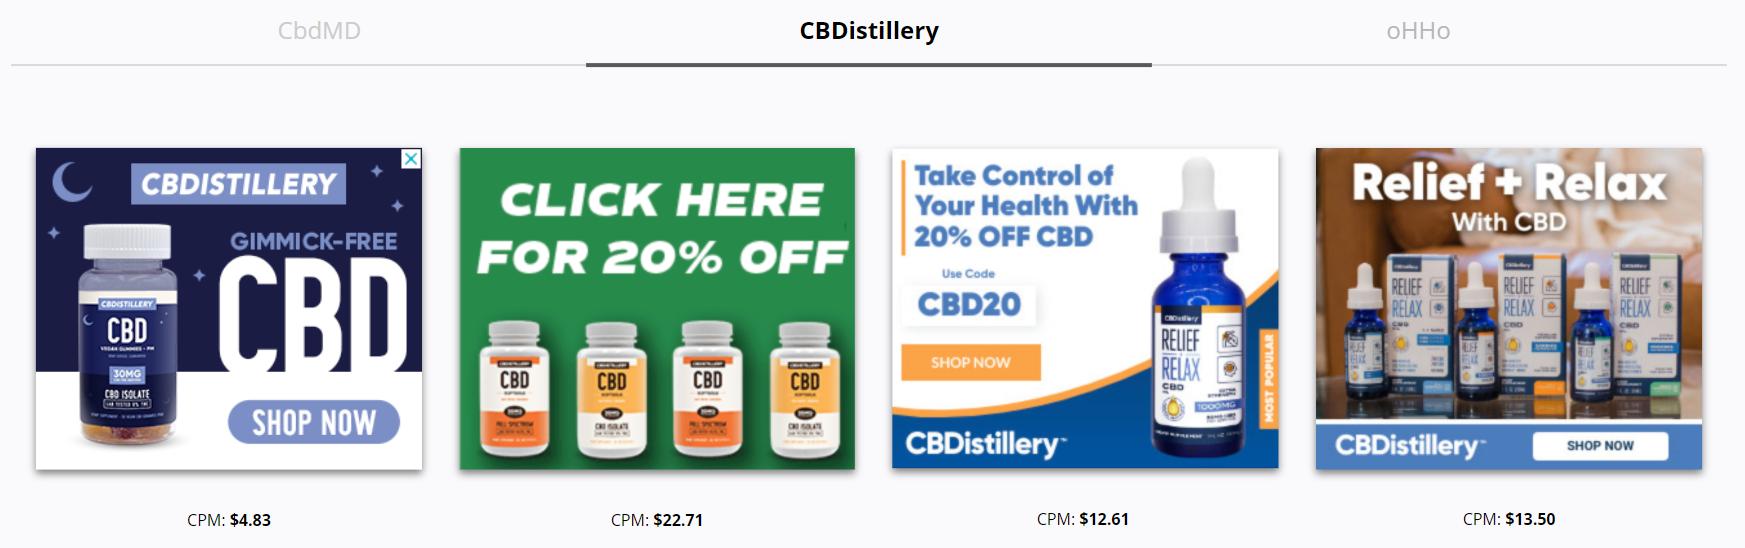 CBDistillery - Shop Now CTA